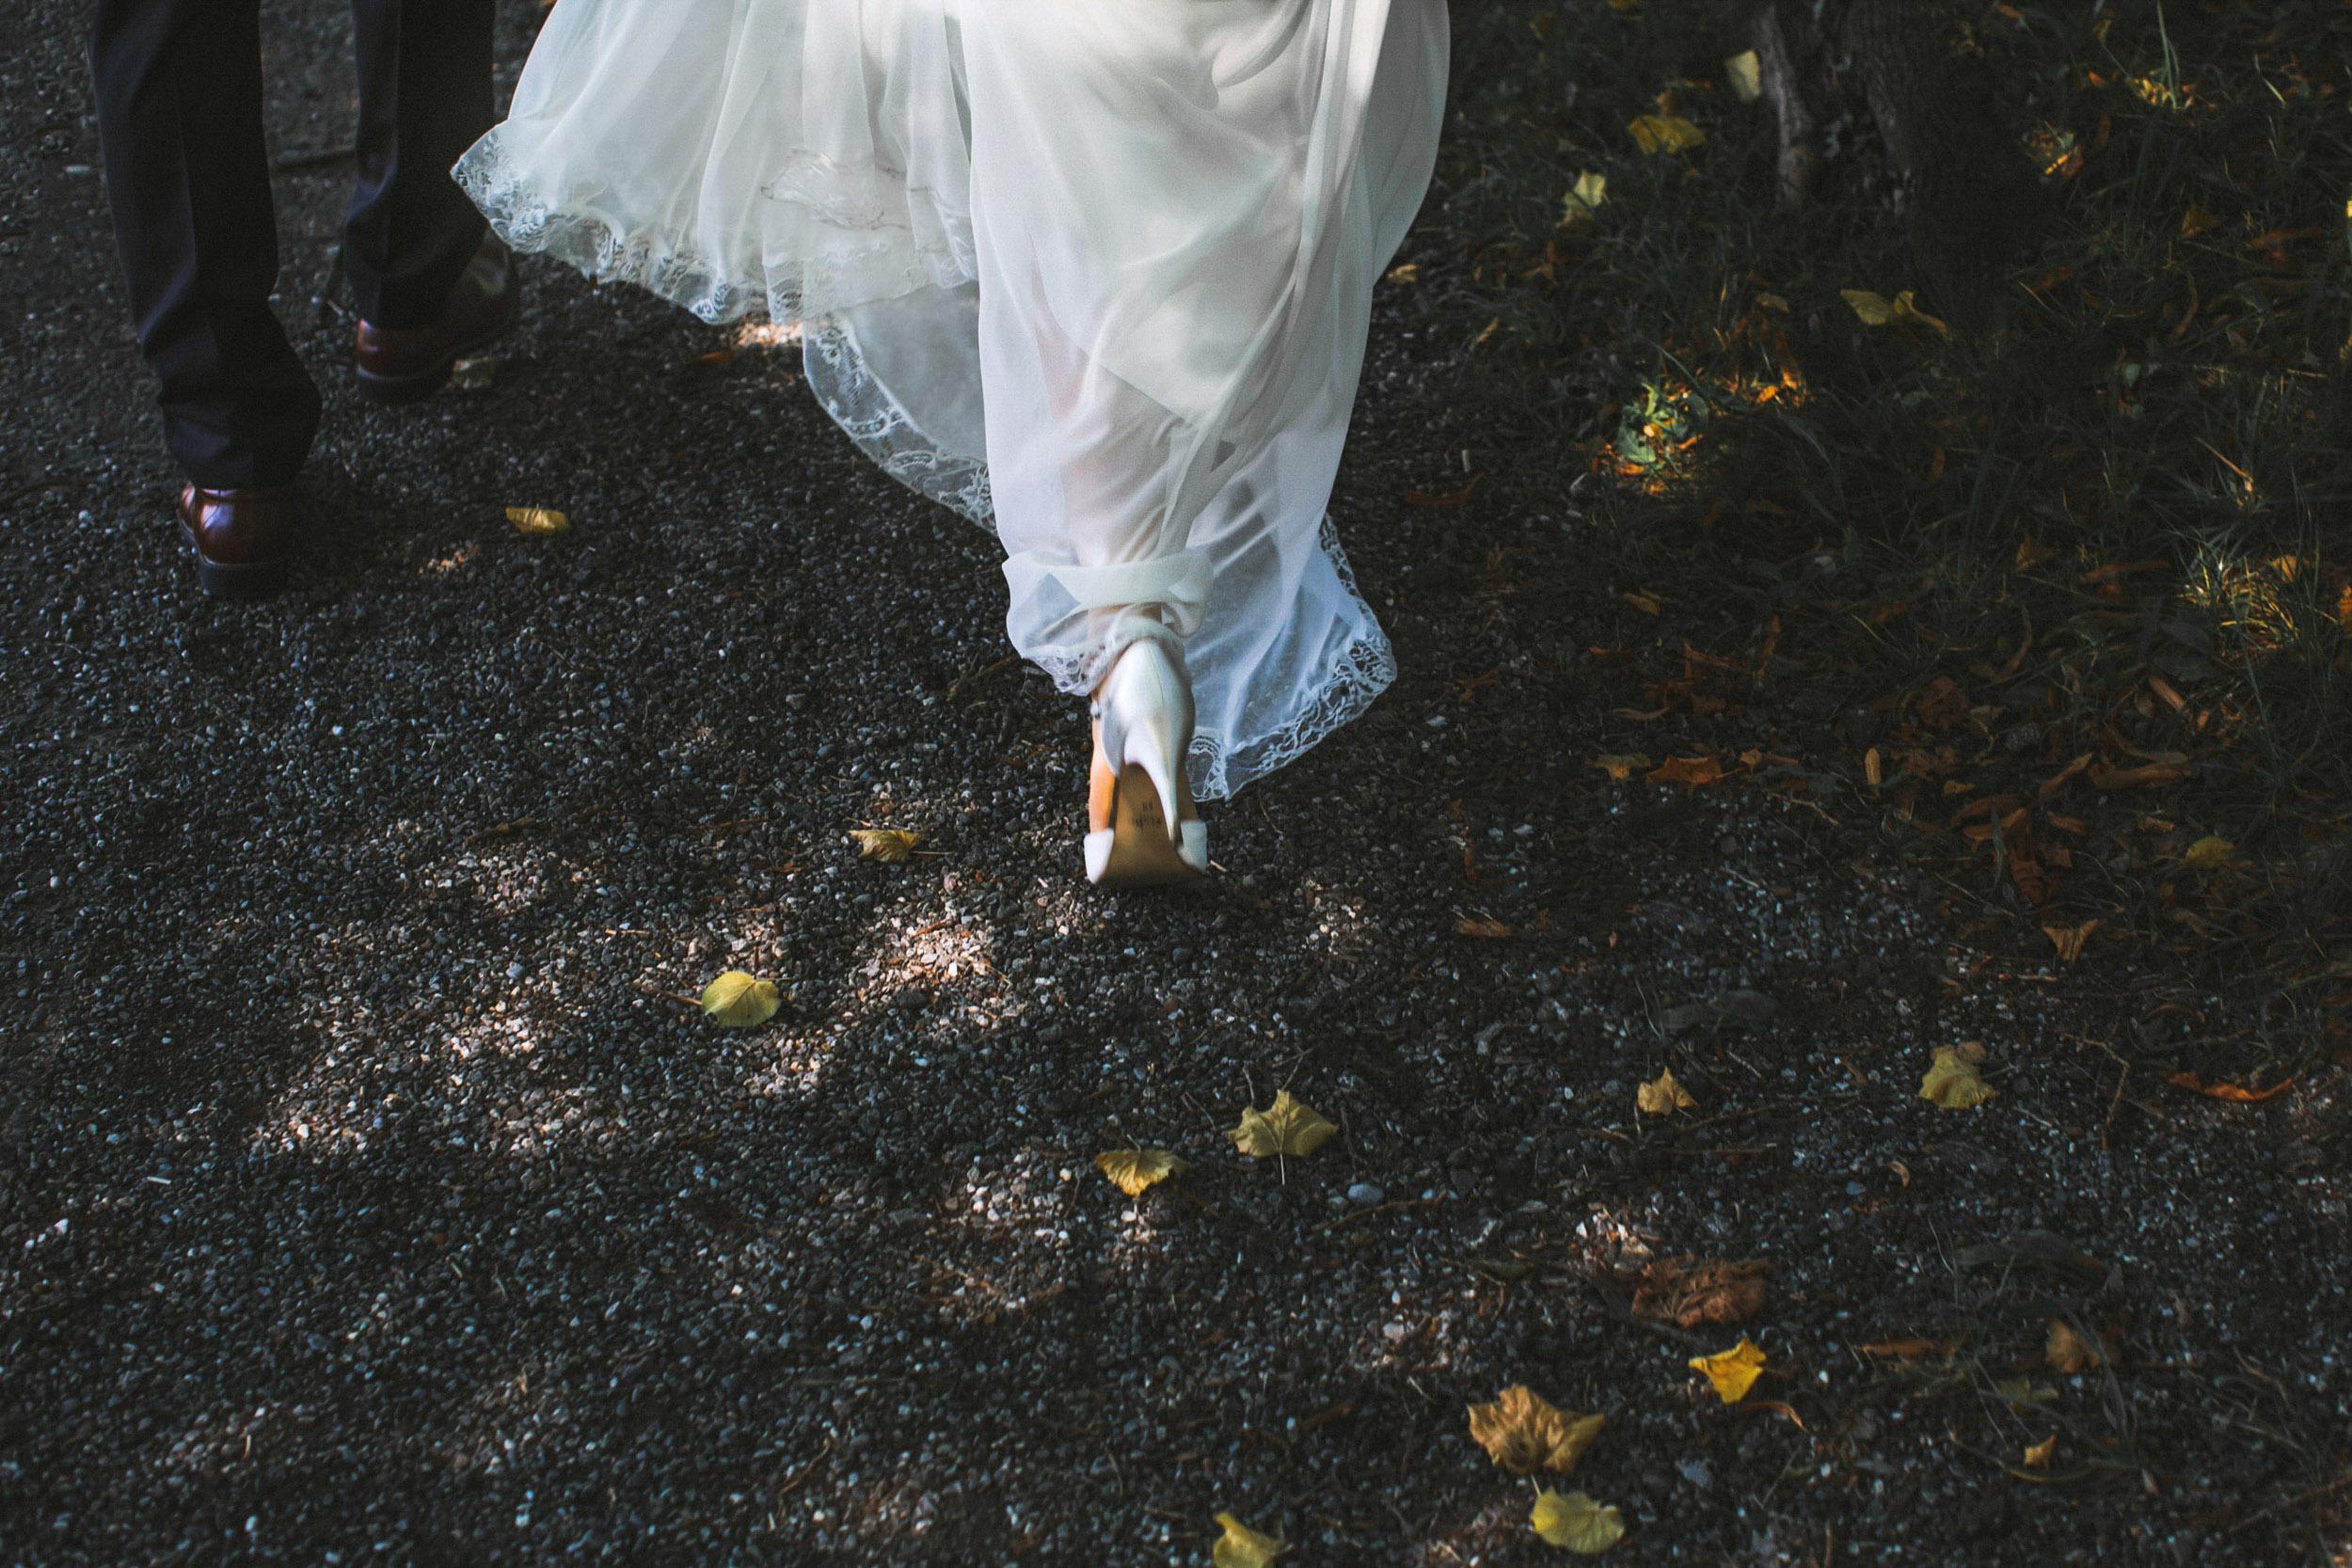 hochzeitsfotografie-schweiz_wedding-photographer-switzerland-europe_Bendik-Photography-004